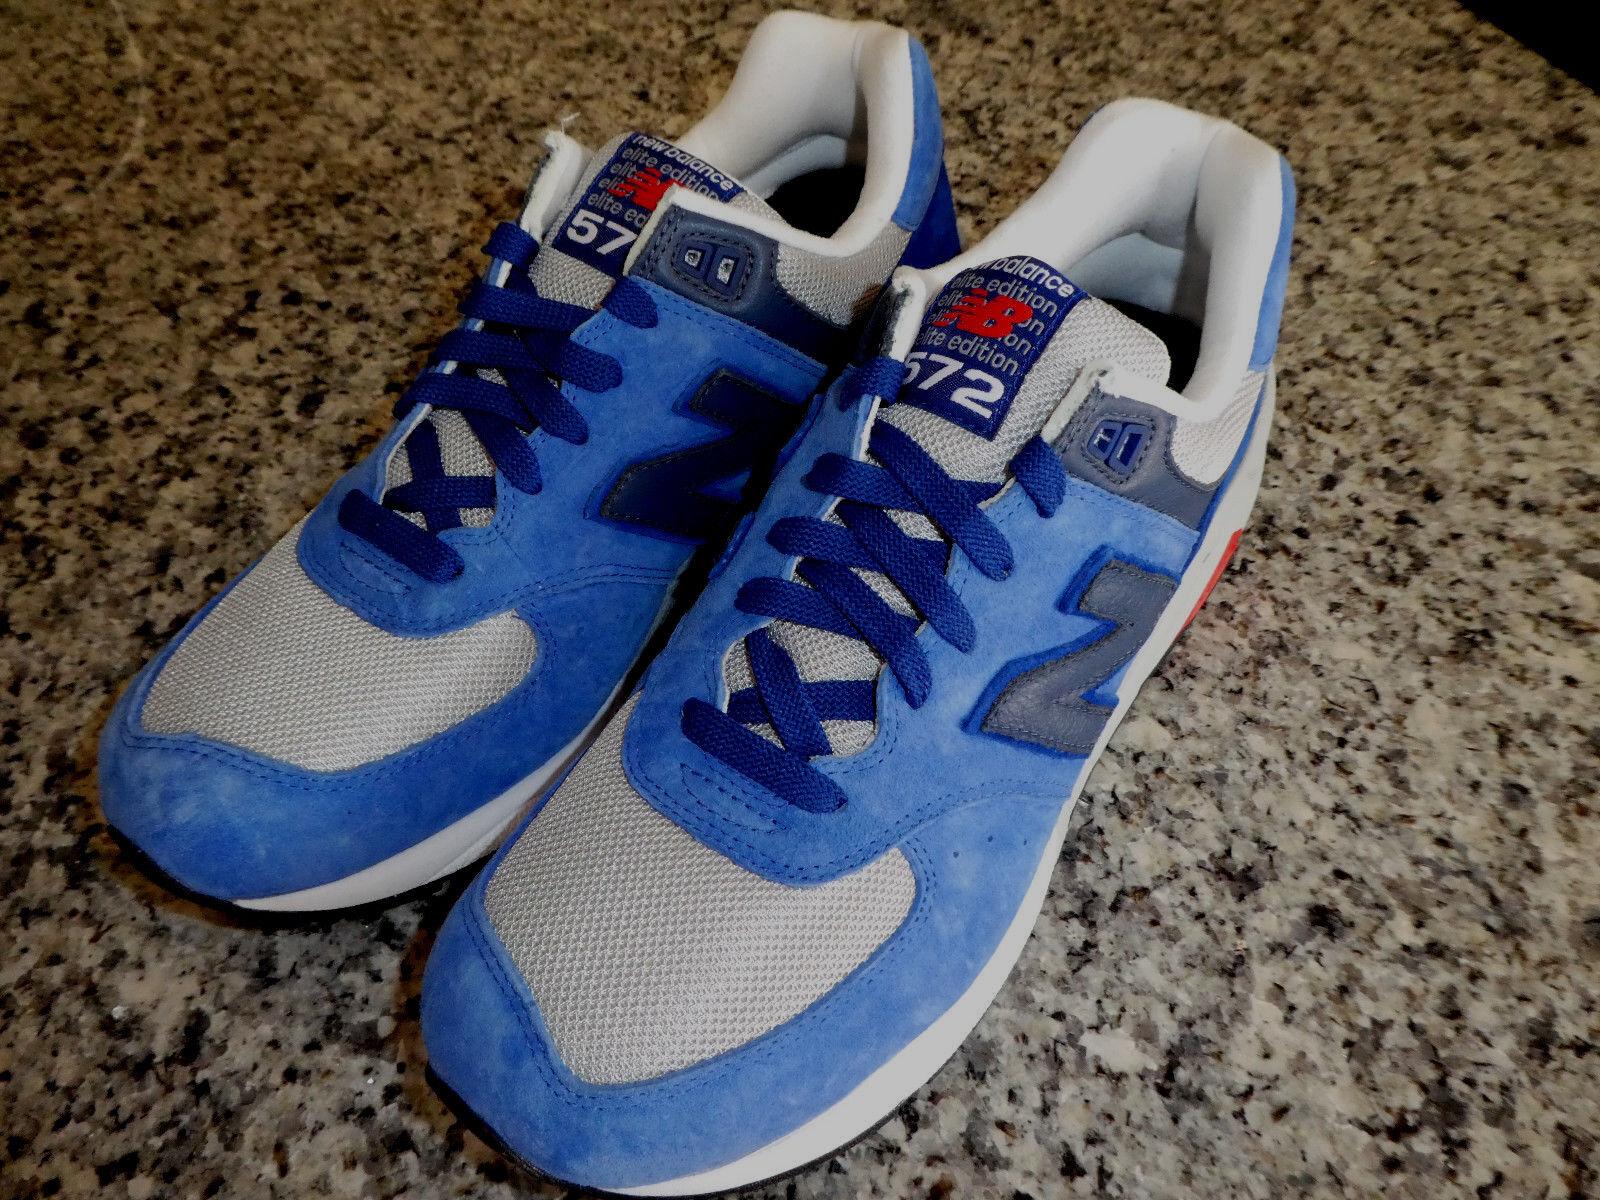 Uomo New Balance 575 Shoes Size 9.5 MRT572BG scarpe da ginnastica